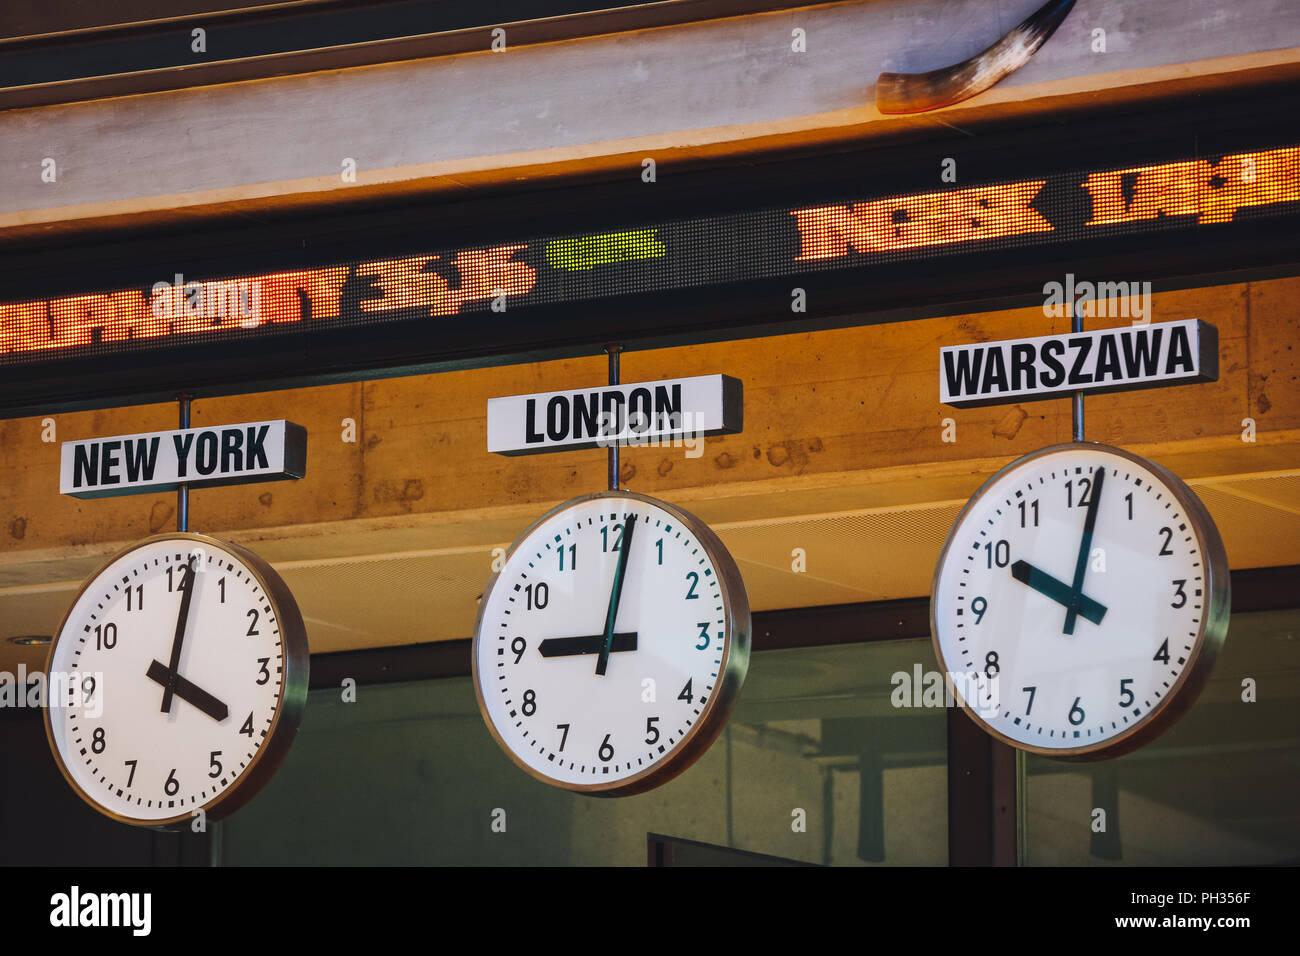 clocks of various time